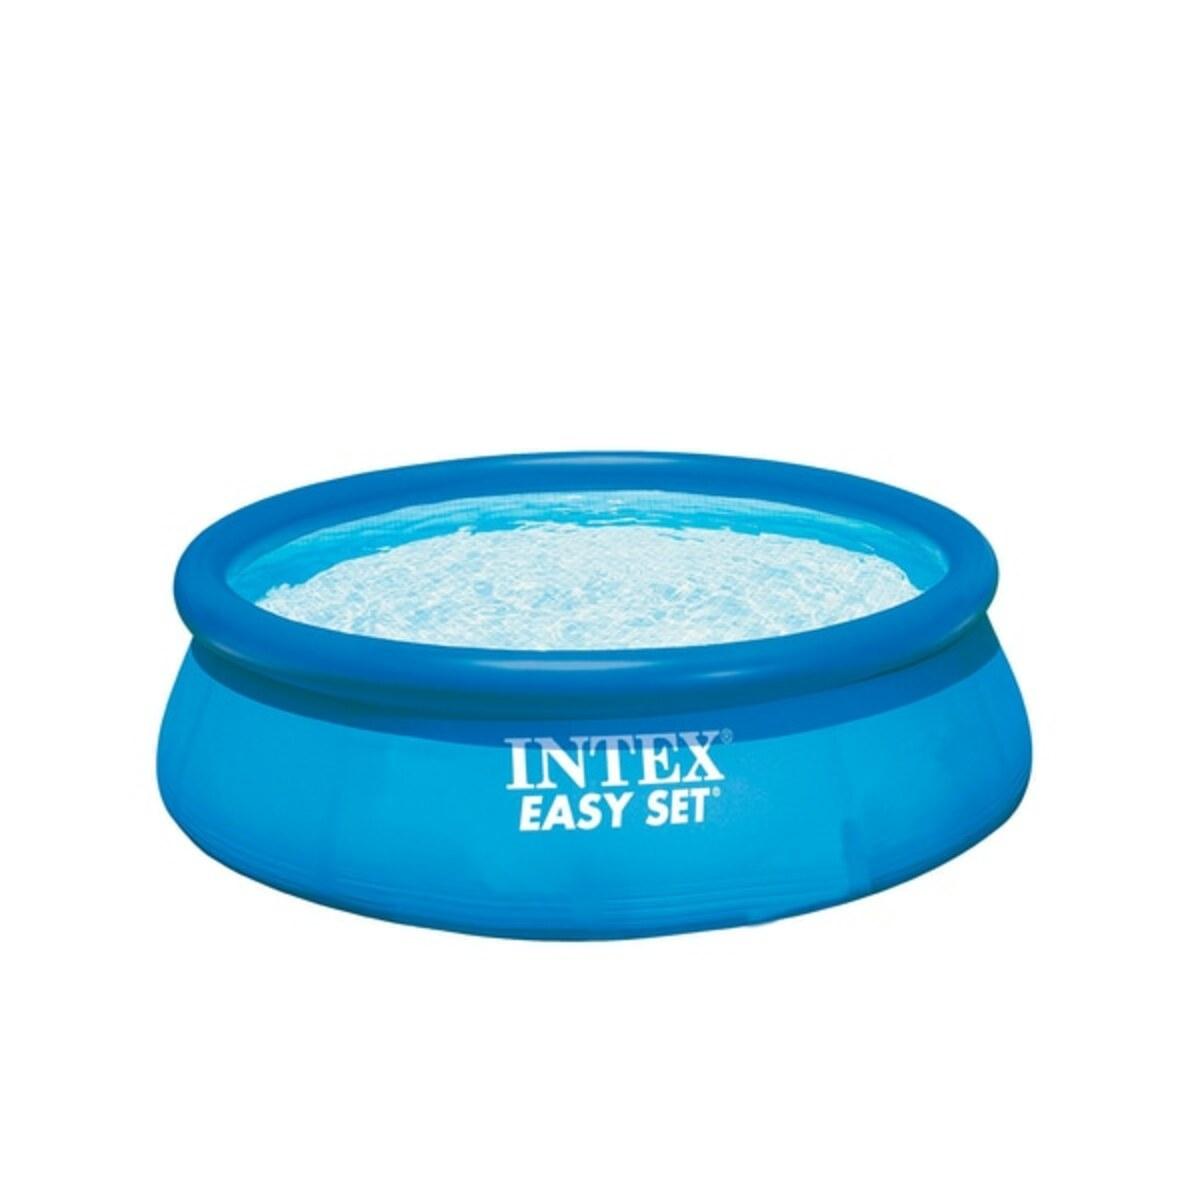 Bild 2 von Intex - Pool Easy Set, 305 cm